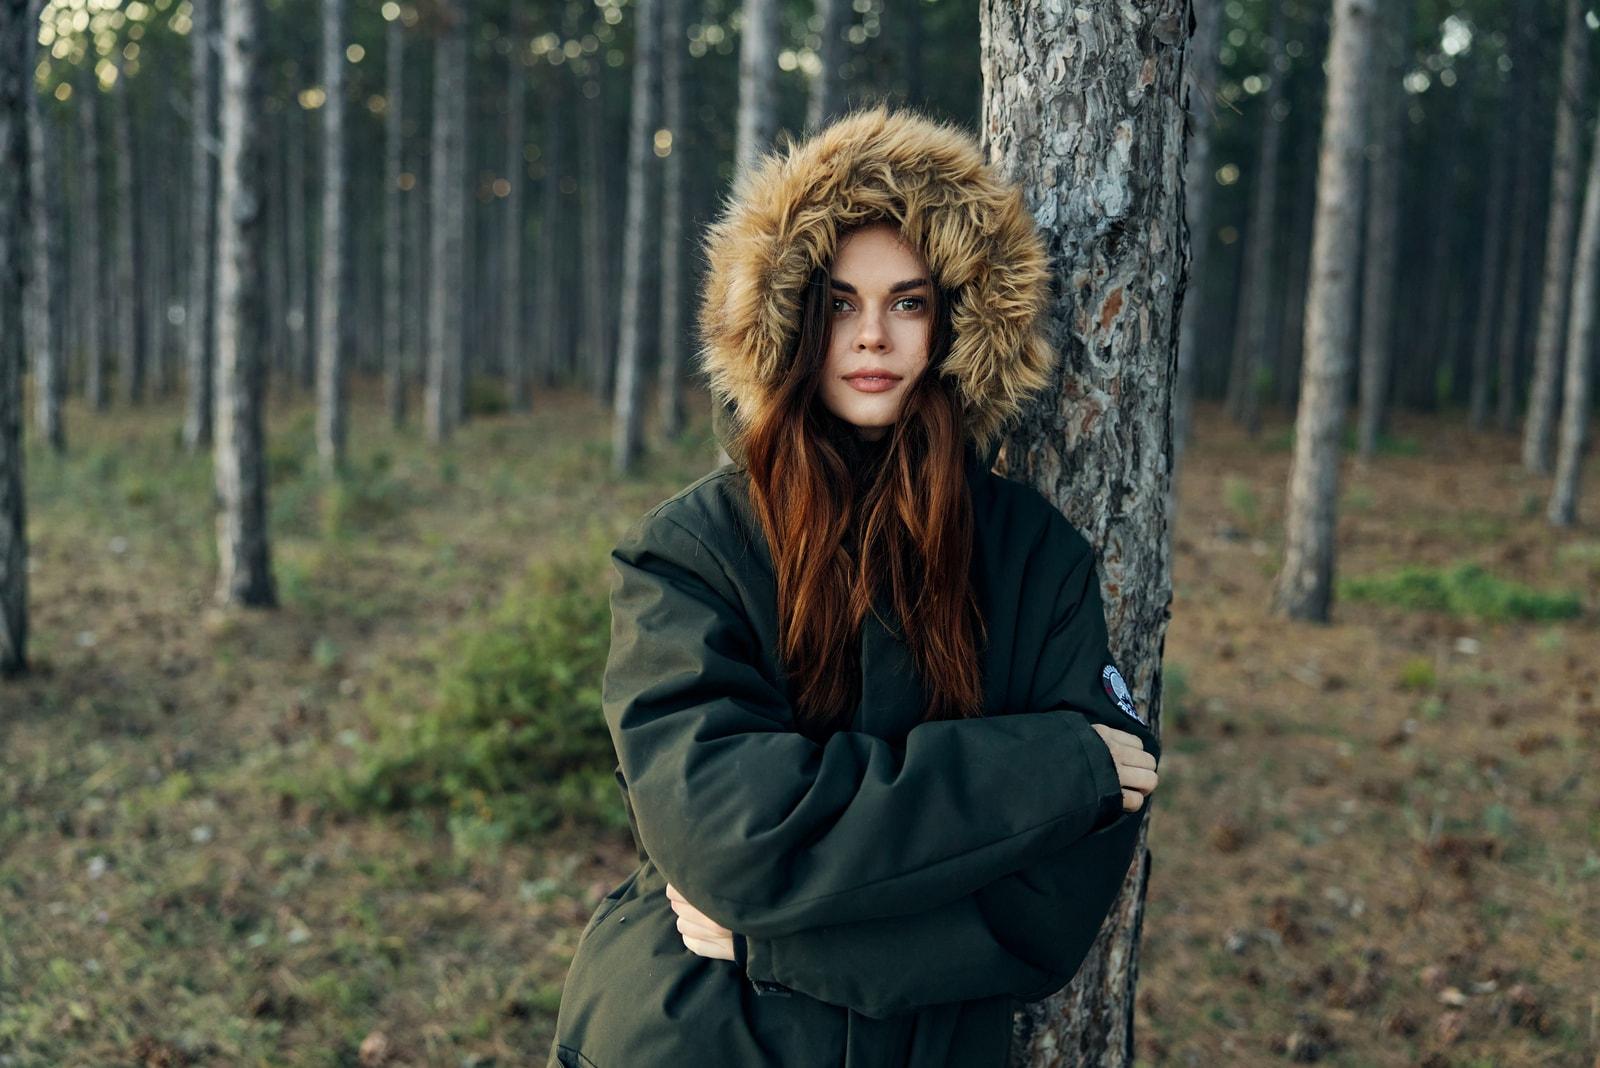 woman in warm jacket leaning on a tree